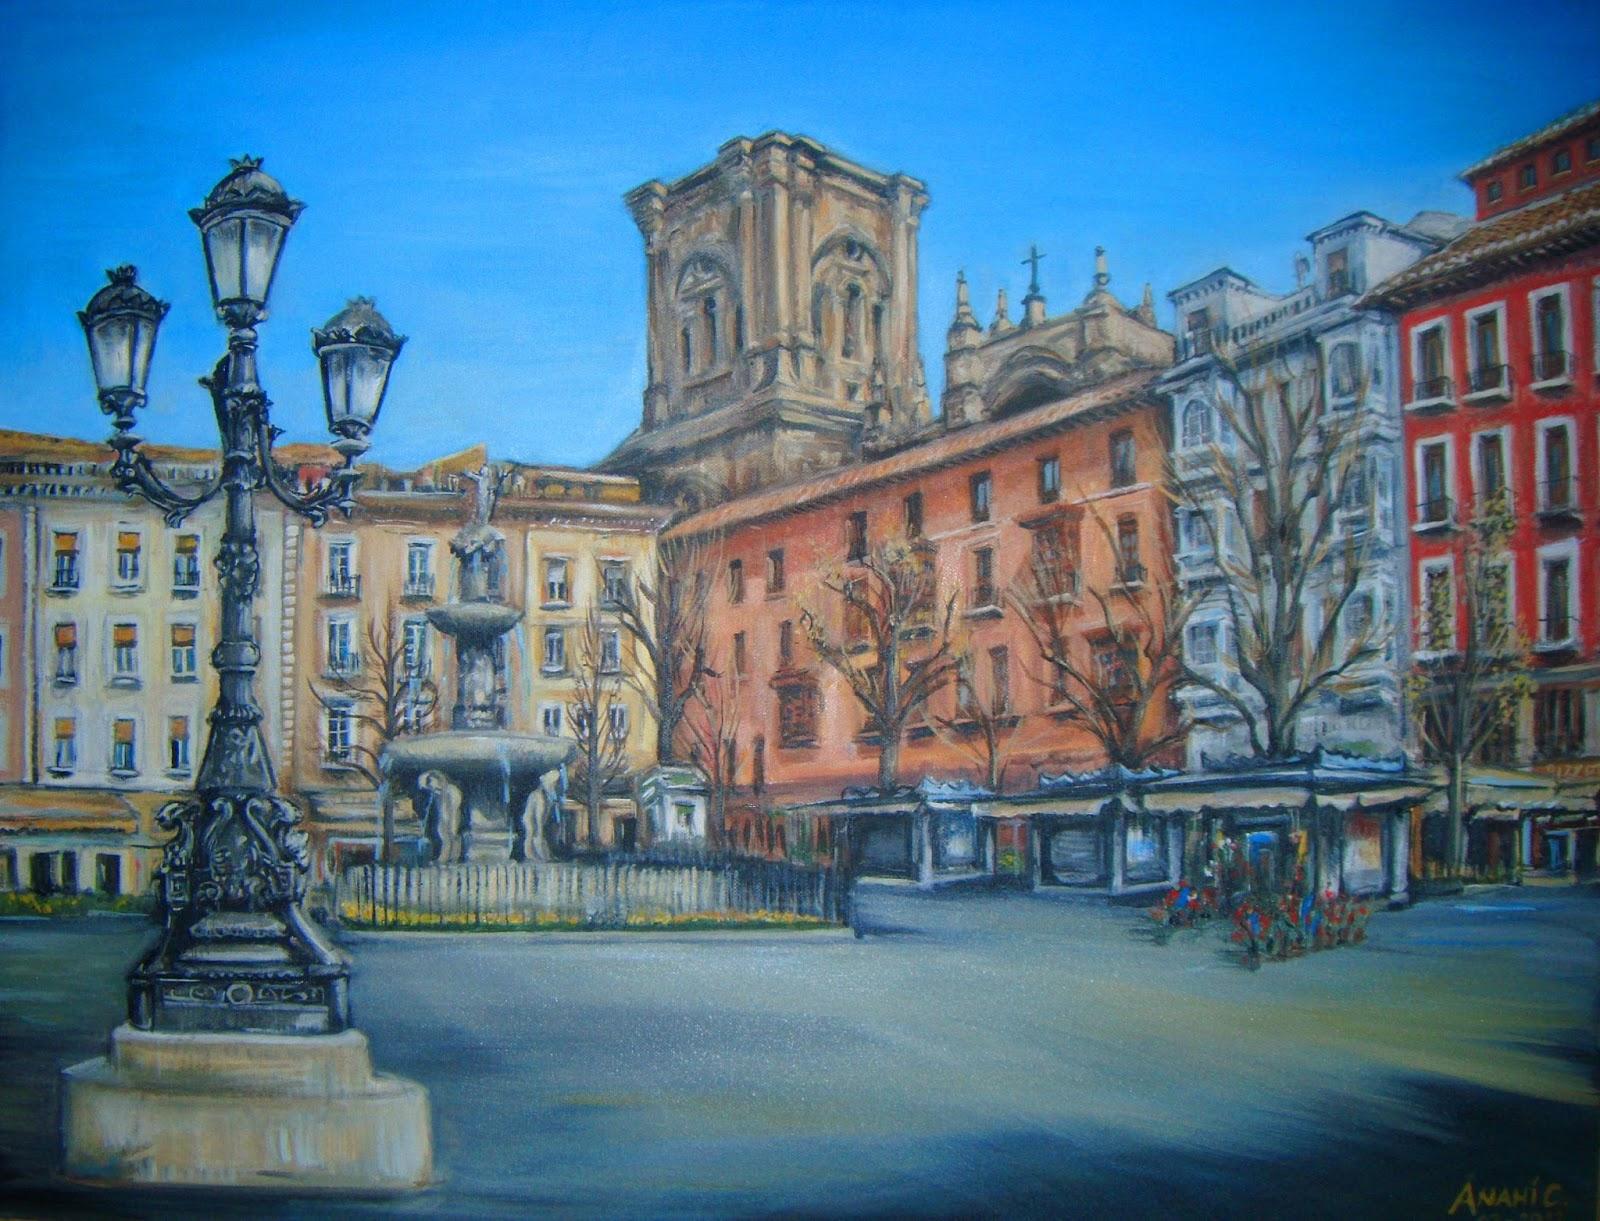 En Granada Plaza Bip Rambla   TALLER DE PINTURA AL AIRE LIBRE